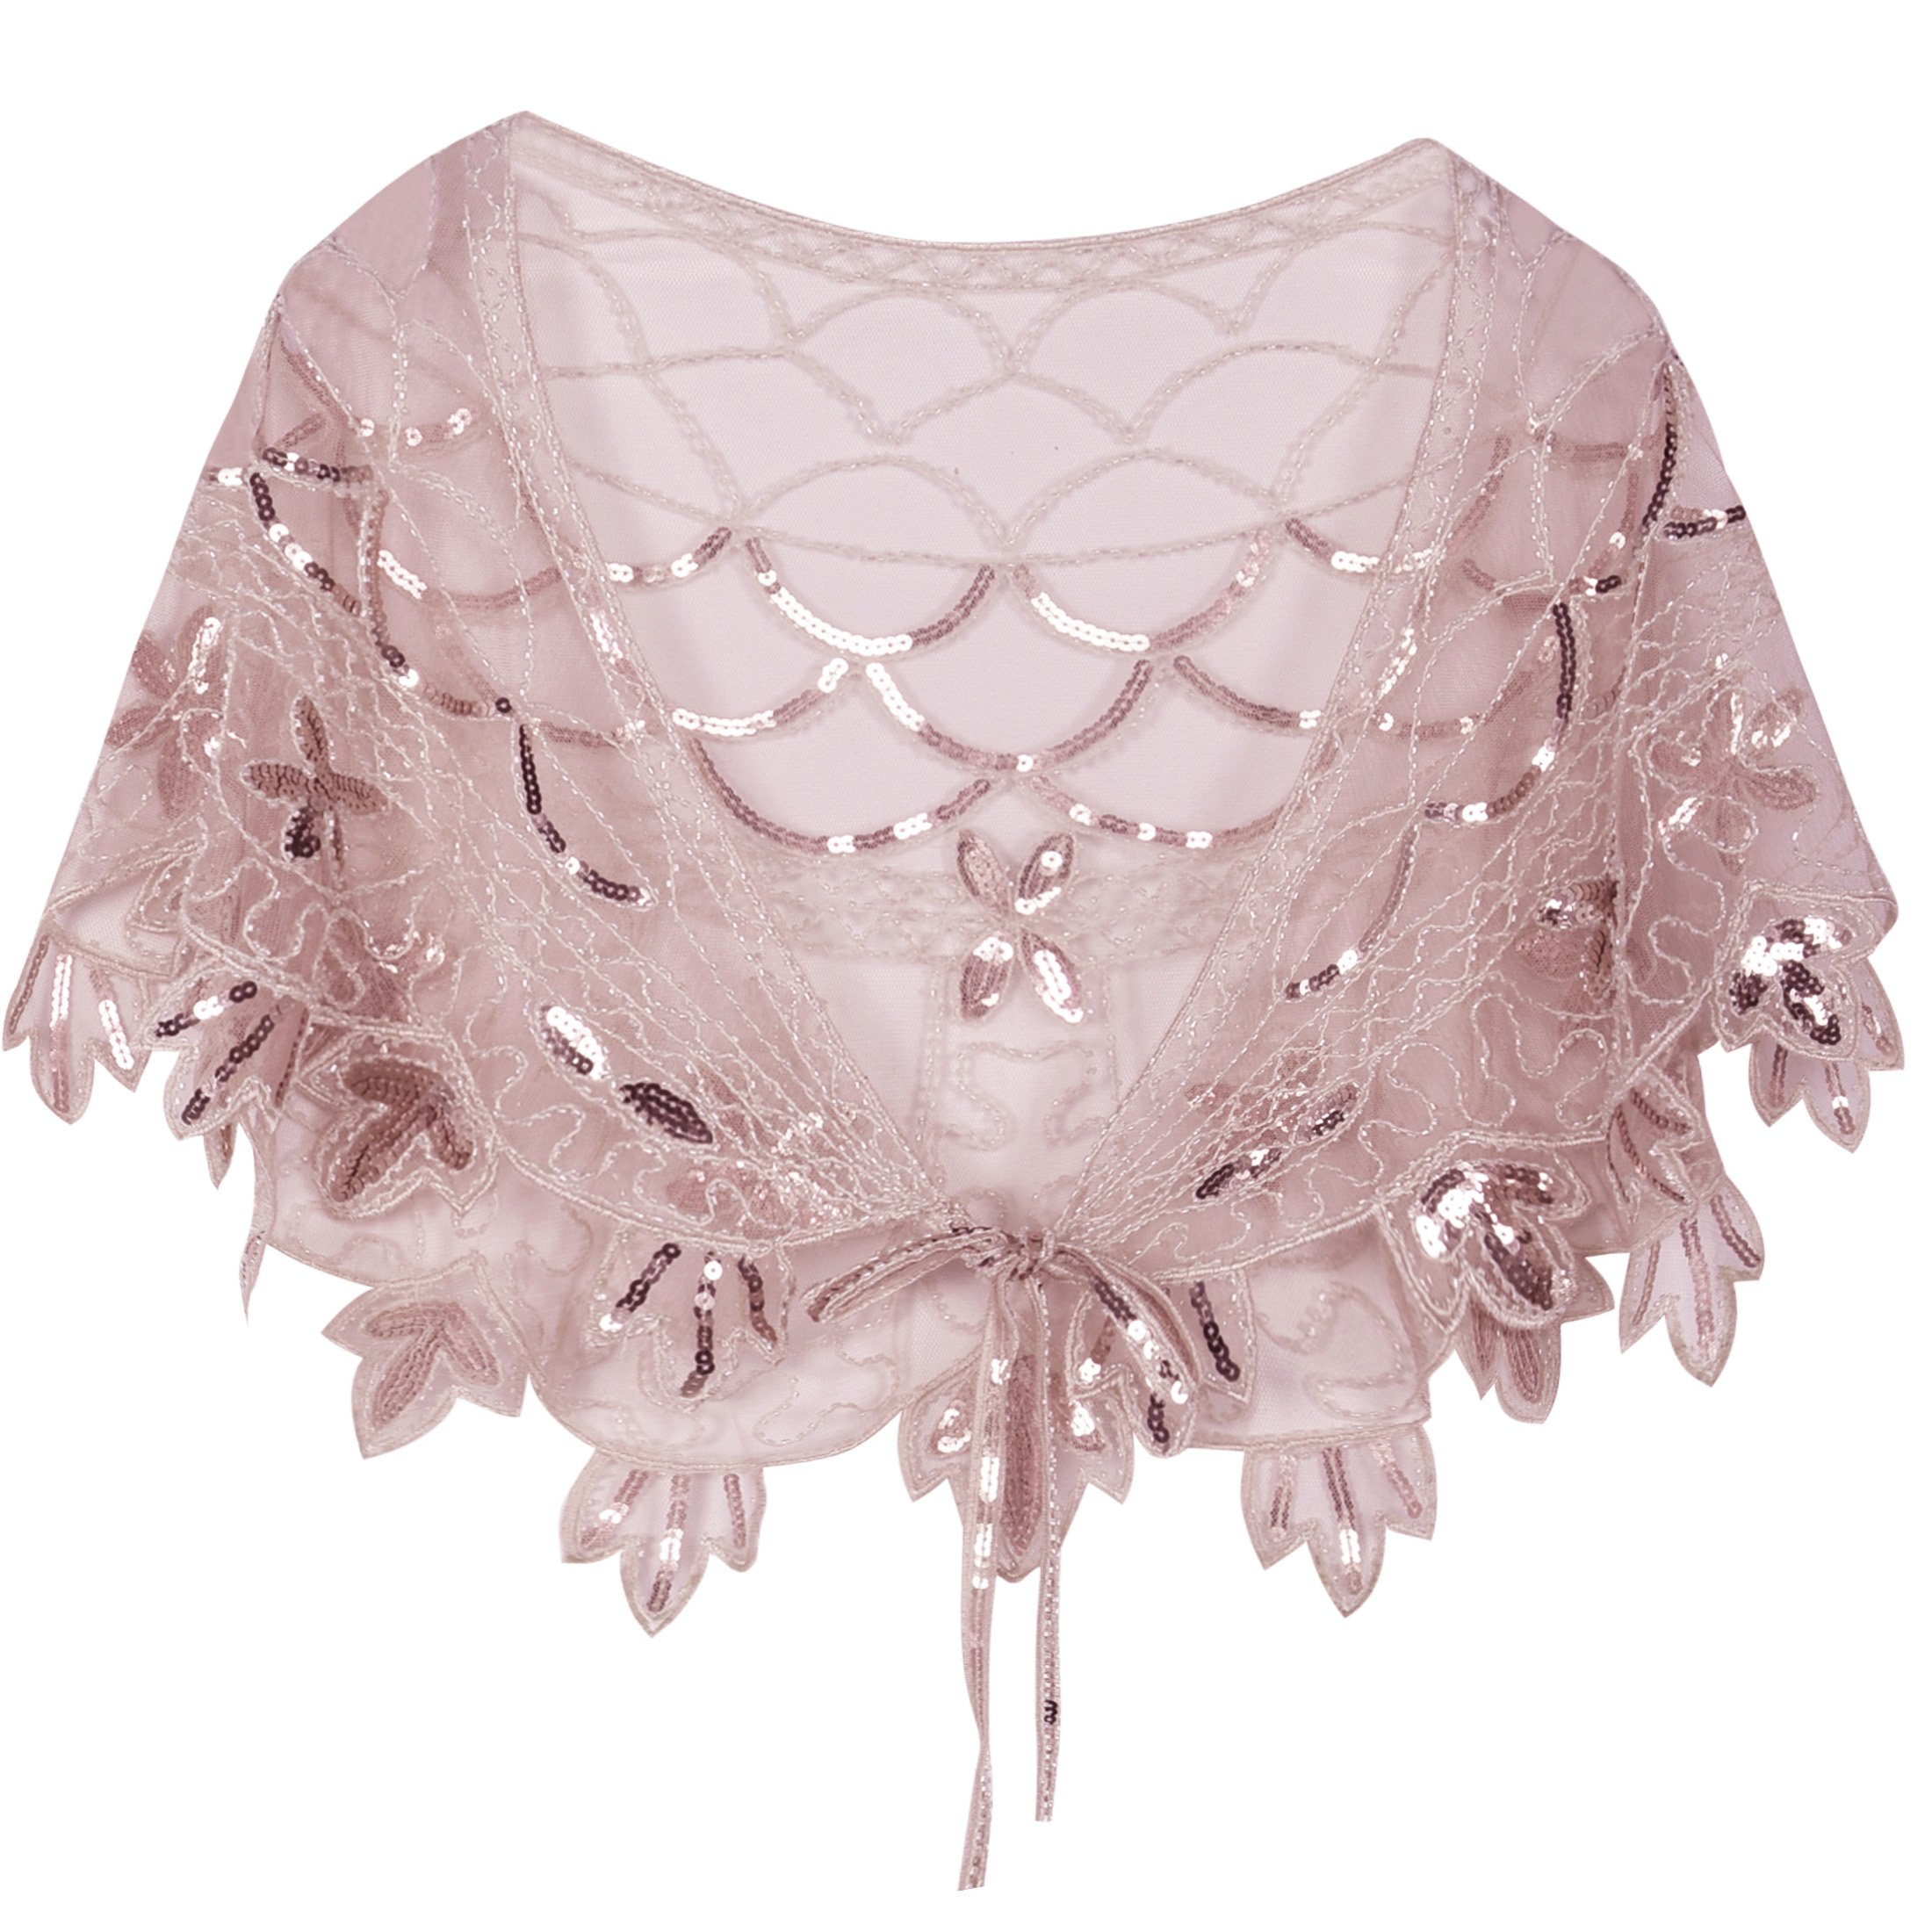 PrettyGuide Women's 1920s Shawl Beaded Vintage Bolero Flapper Evening Wraps Pink